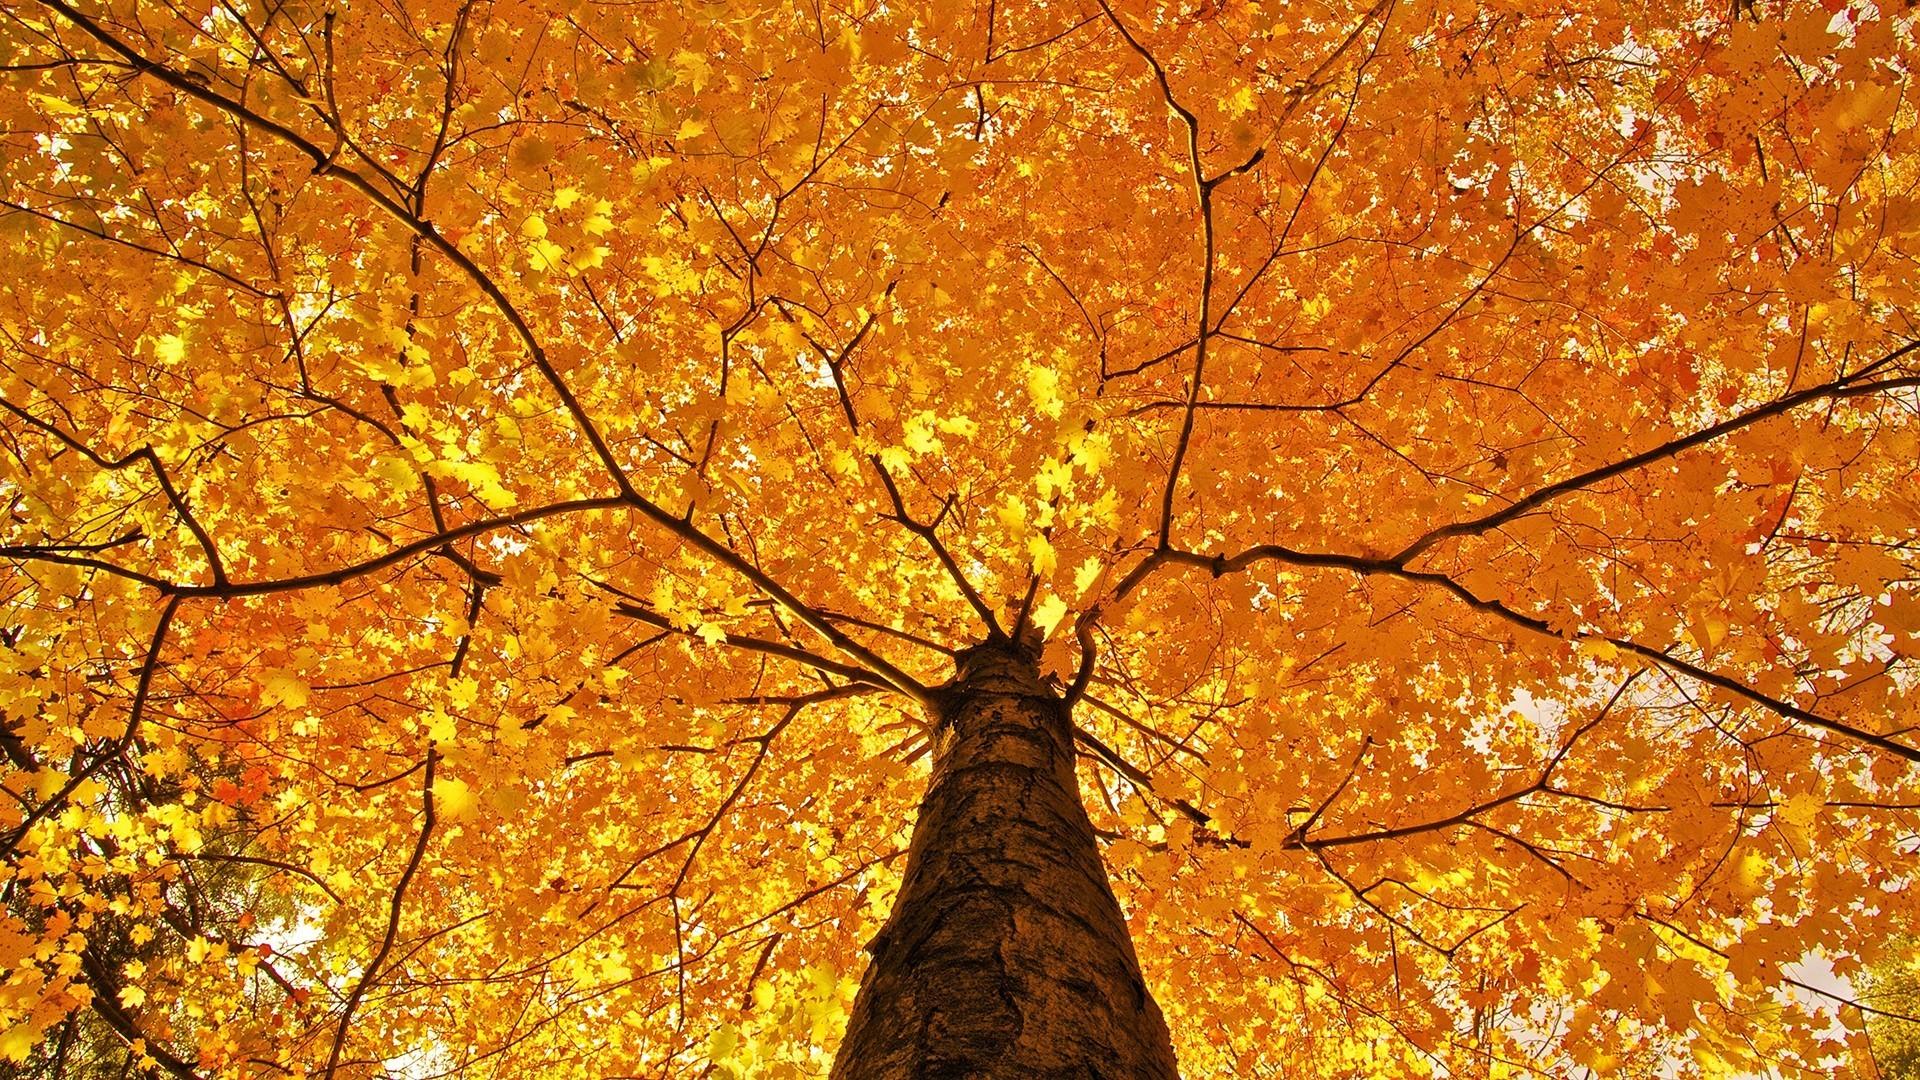 Pin by LU LU BELL on CHANGE OF SEASONS Wallpaper Autumn Autumn